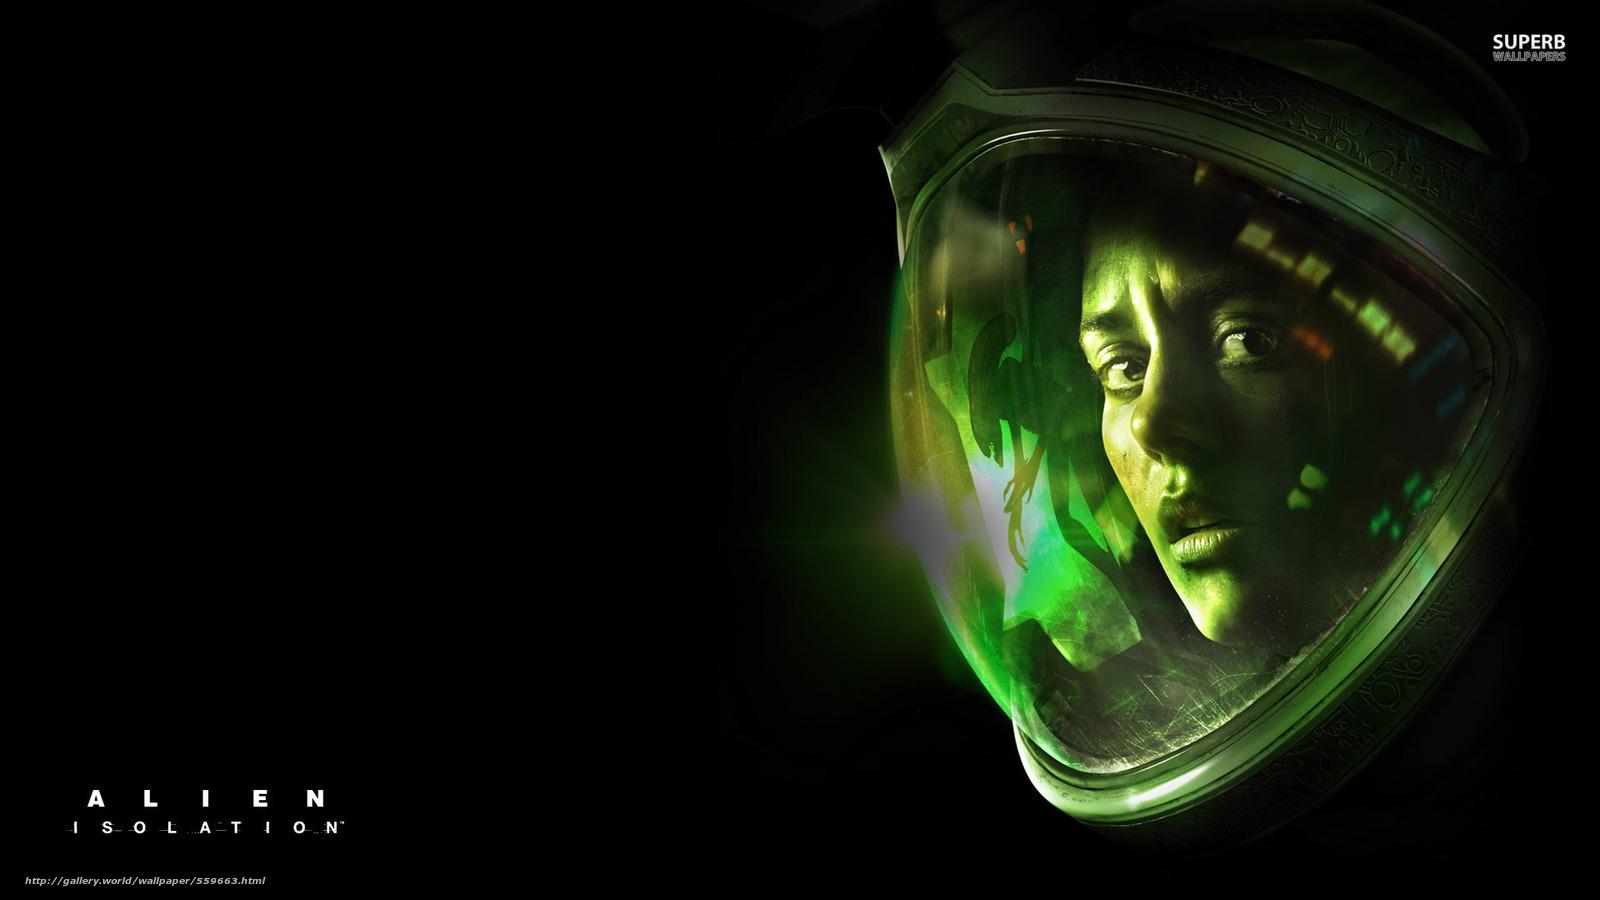 Download wallpaper Alien: Isolation,  games free desktop wallpaper in the resolution 1920x1080 — picture №559663